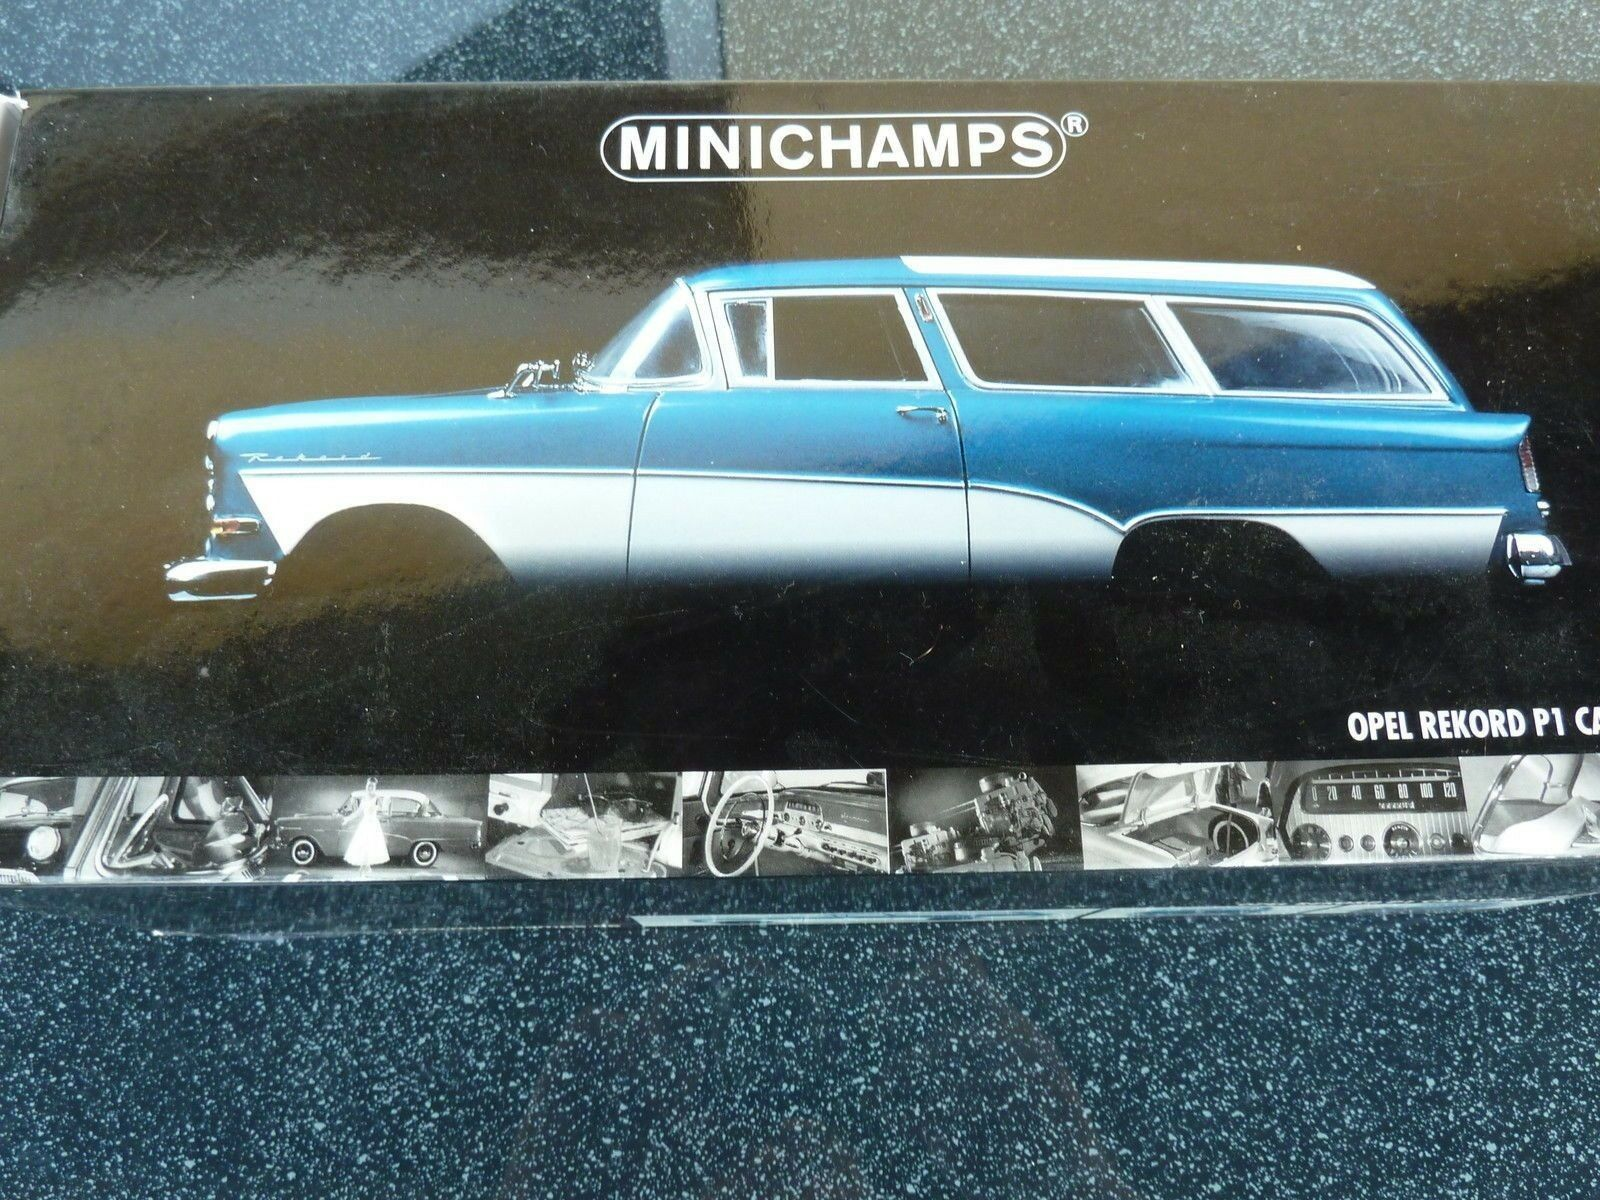 1 18 Minichamps - - Opel Rekord P1 1958 Caravan Estate blueee White